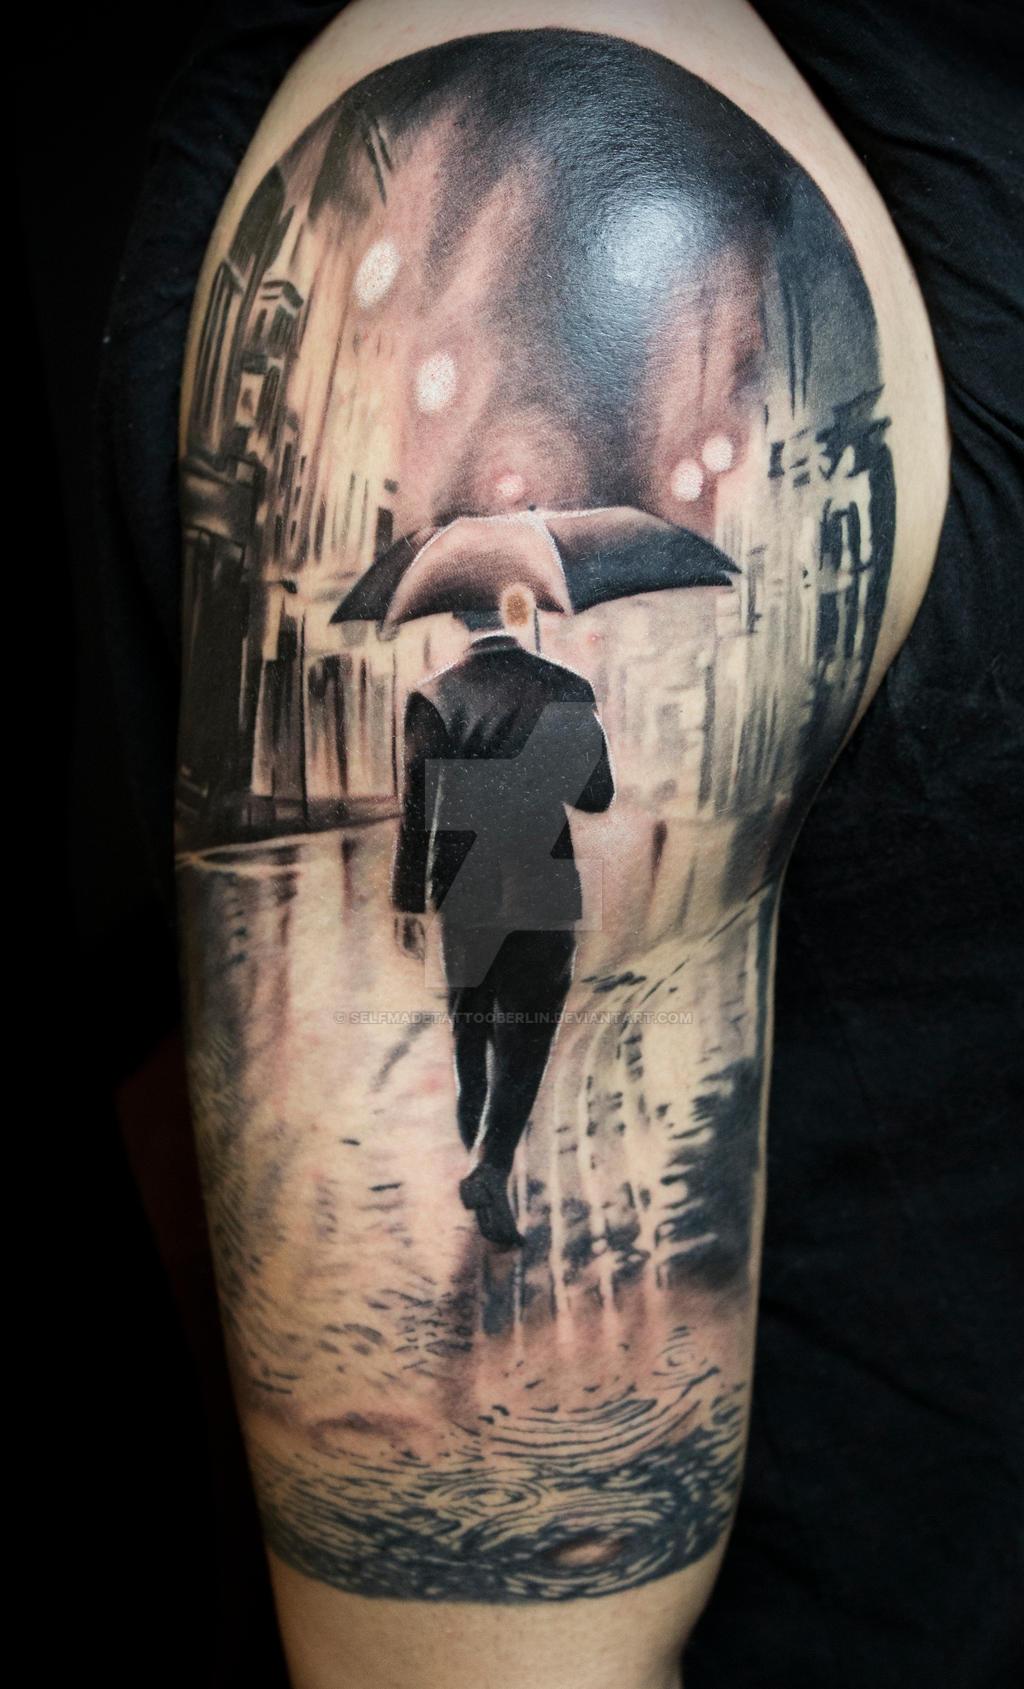 Singing in the rain tattoo by SelfmadeTattooBerlin